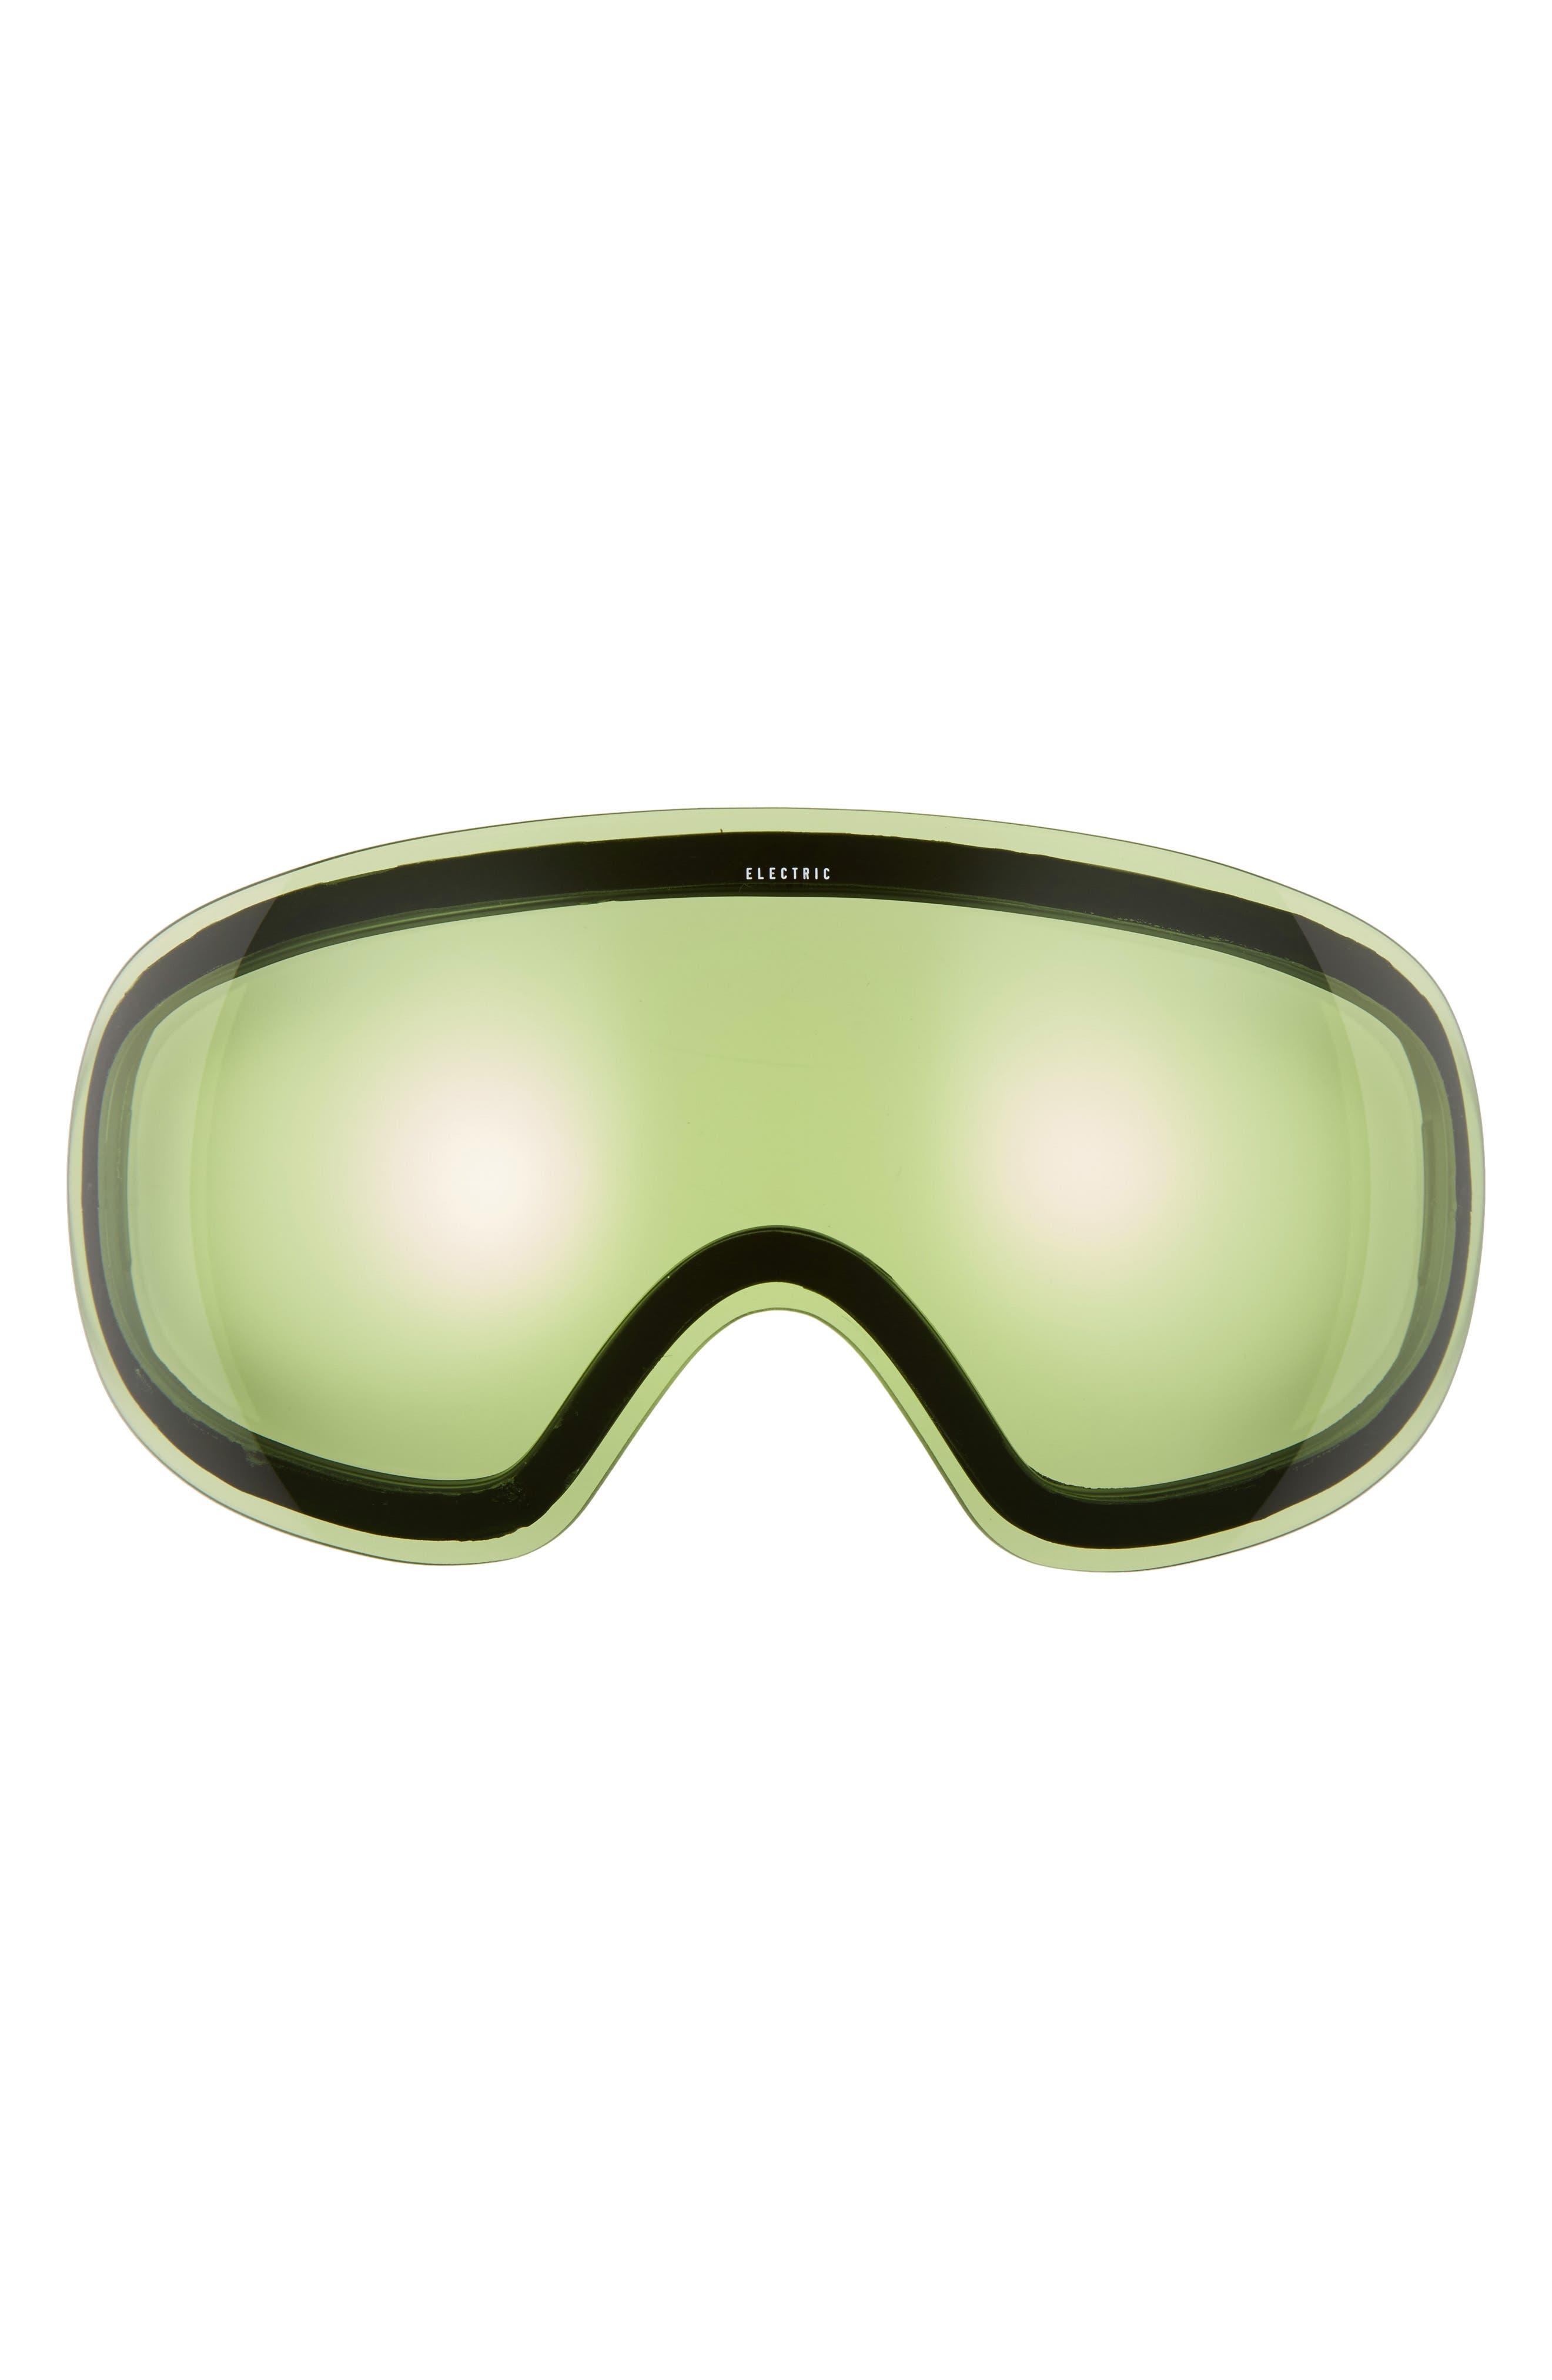 EG3 254mm Snow Goggles,                             Alternate thumbnail 29, color,